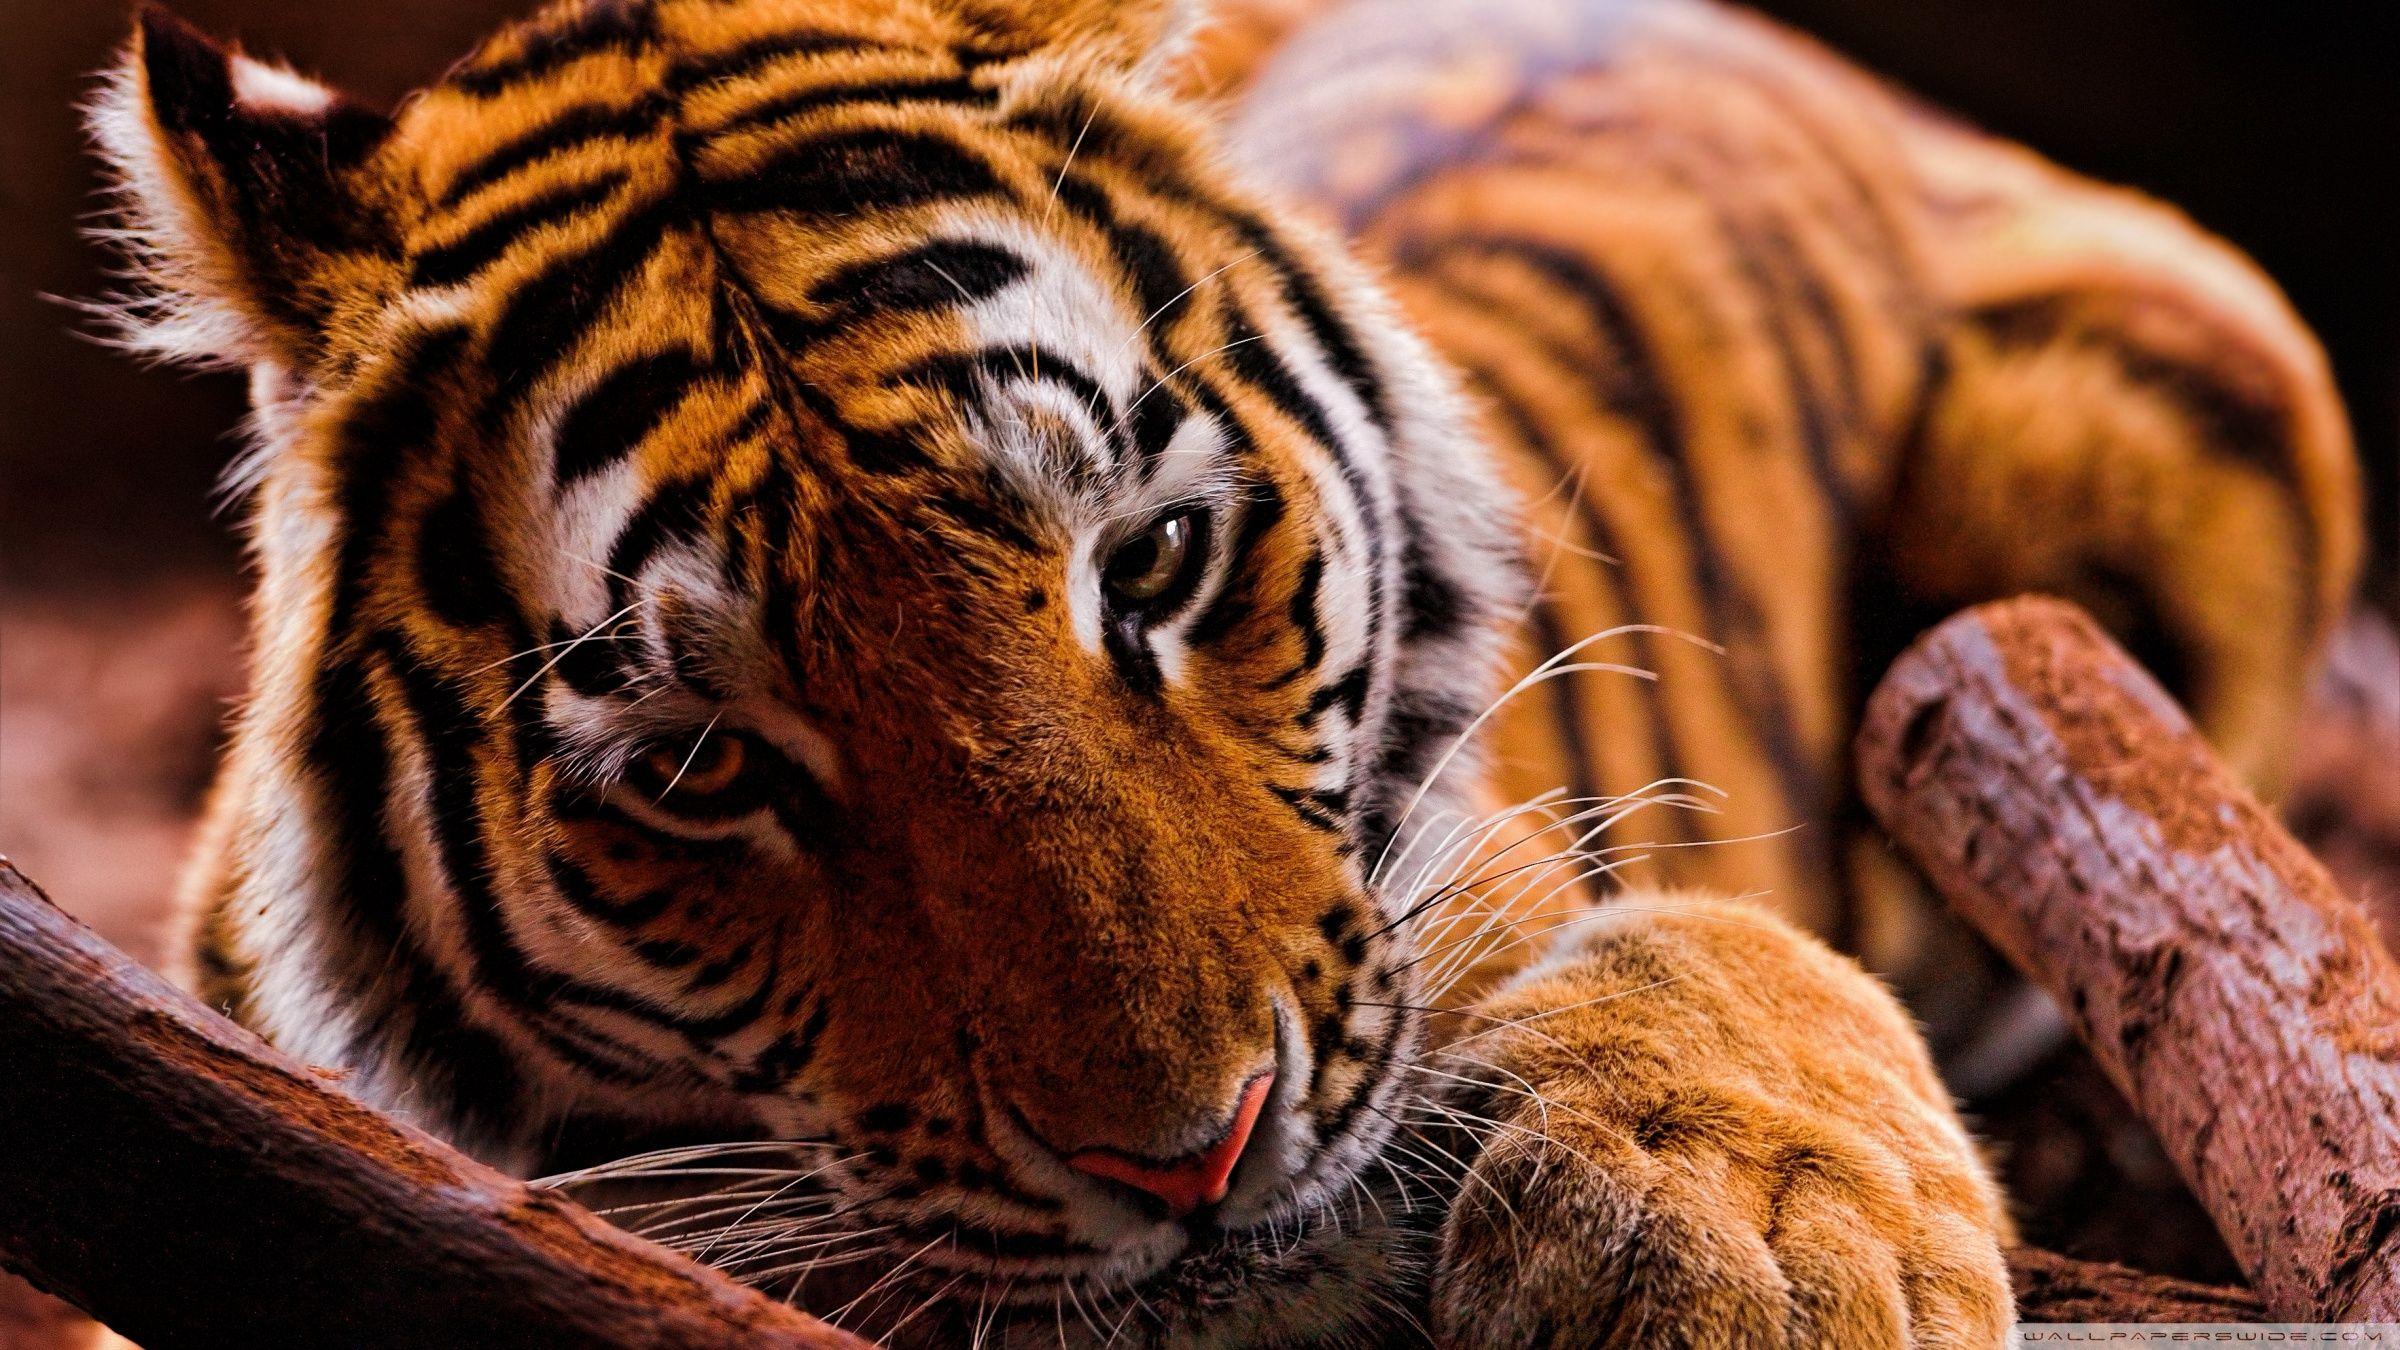 the teal tiger Cute wild animals, Animals, Tiger wallpaper